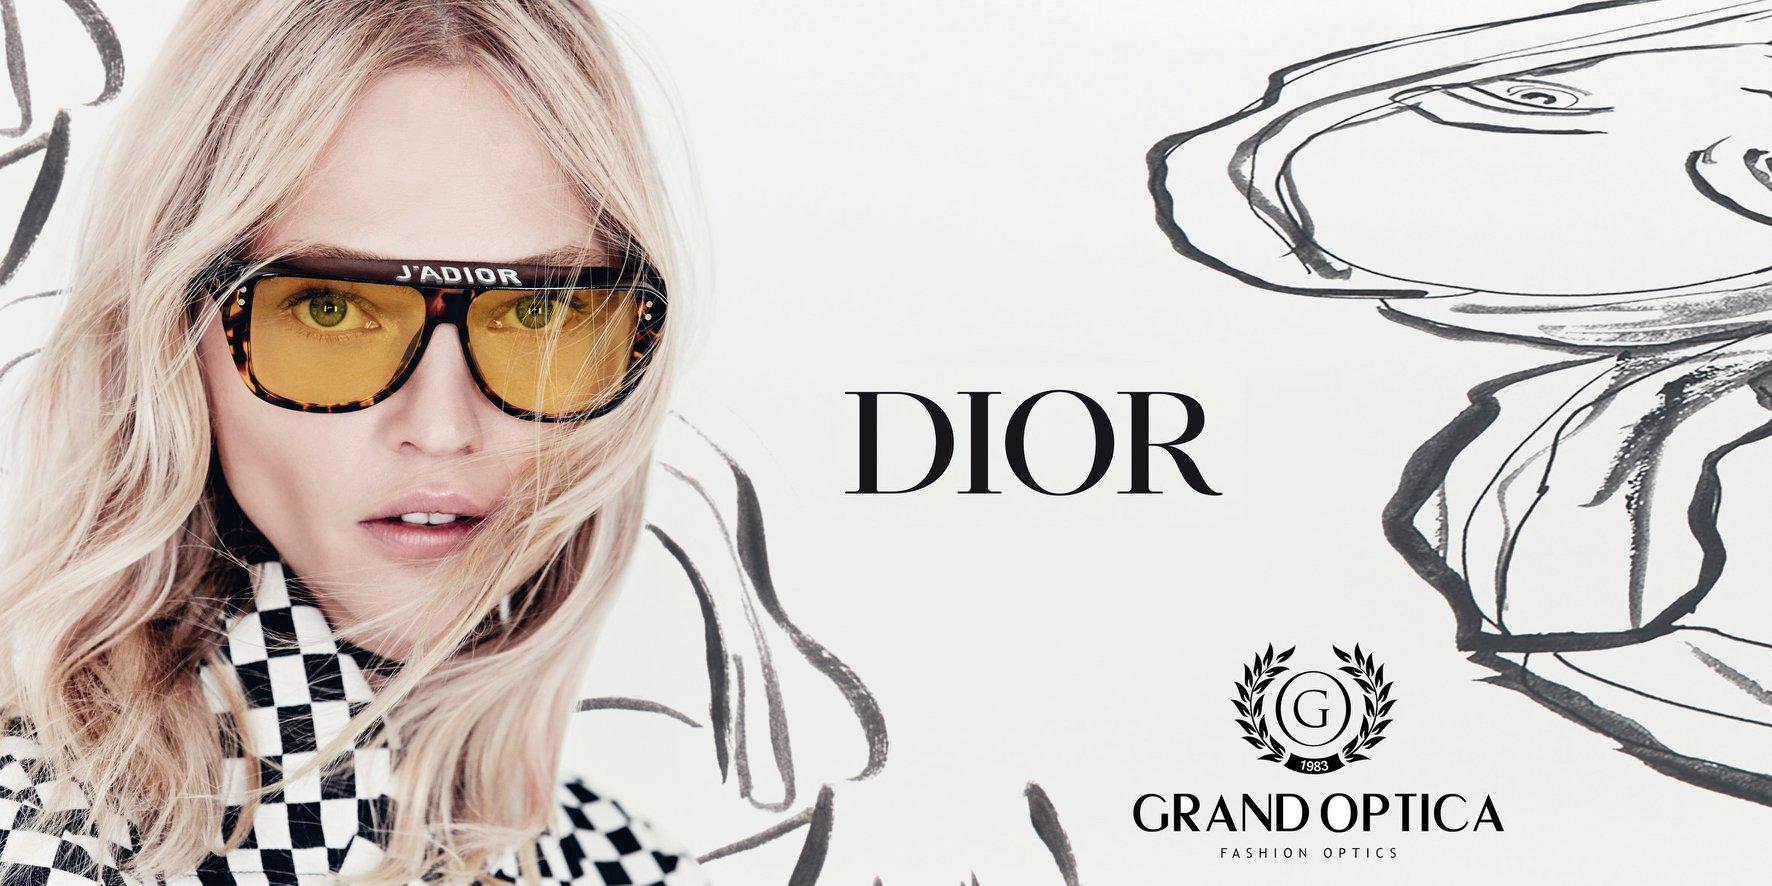 Grand Optica - главный дистрибьютор Dior в Молдове